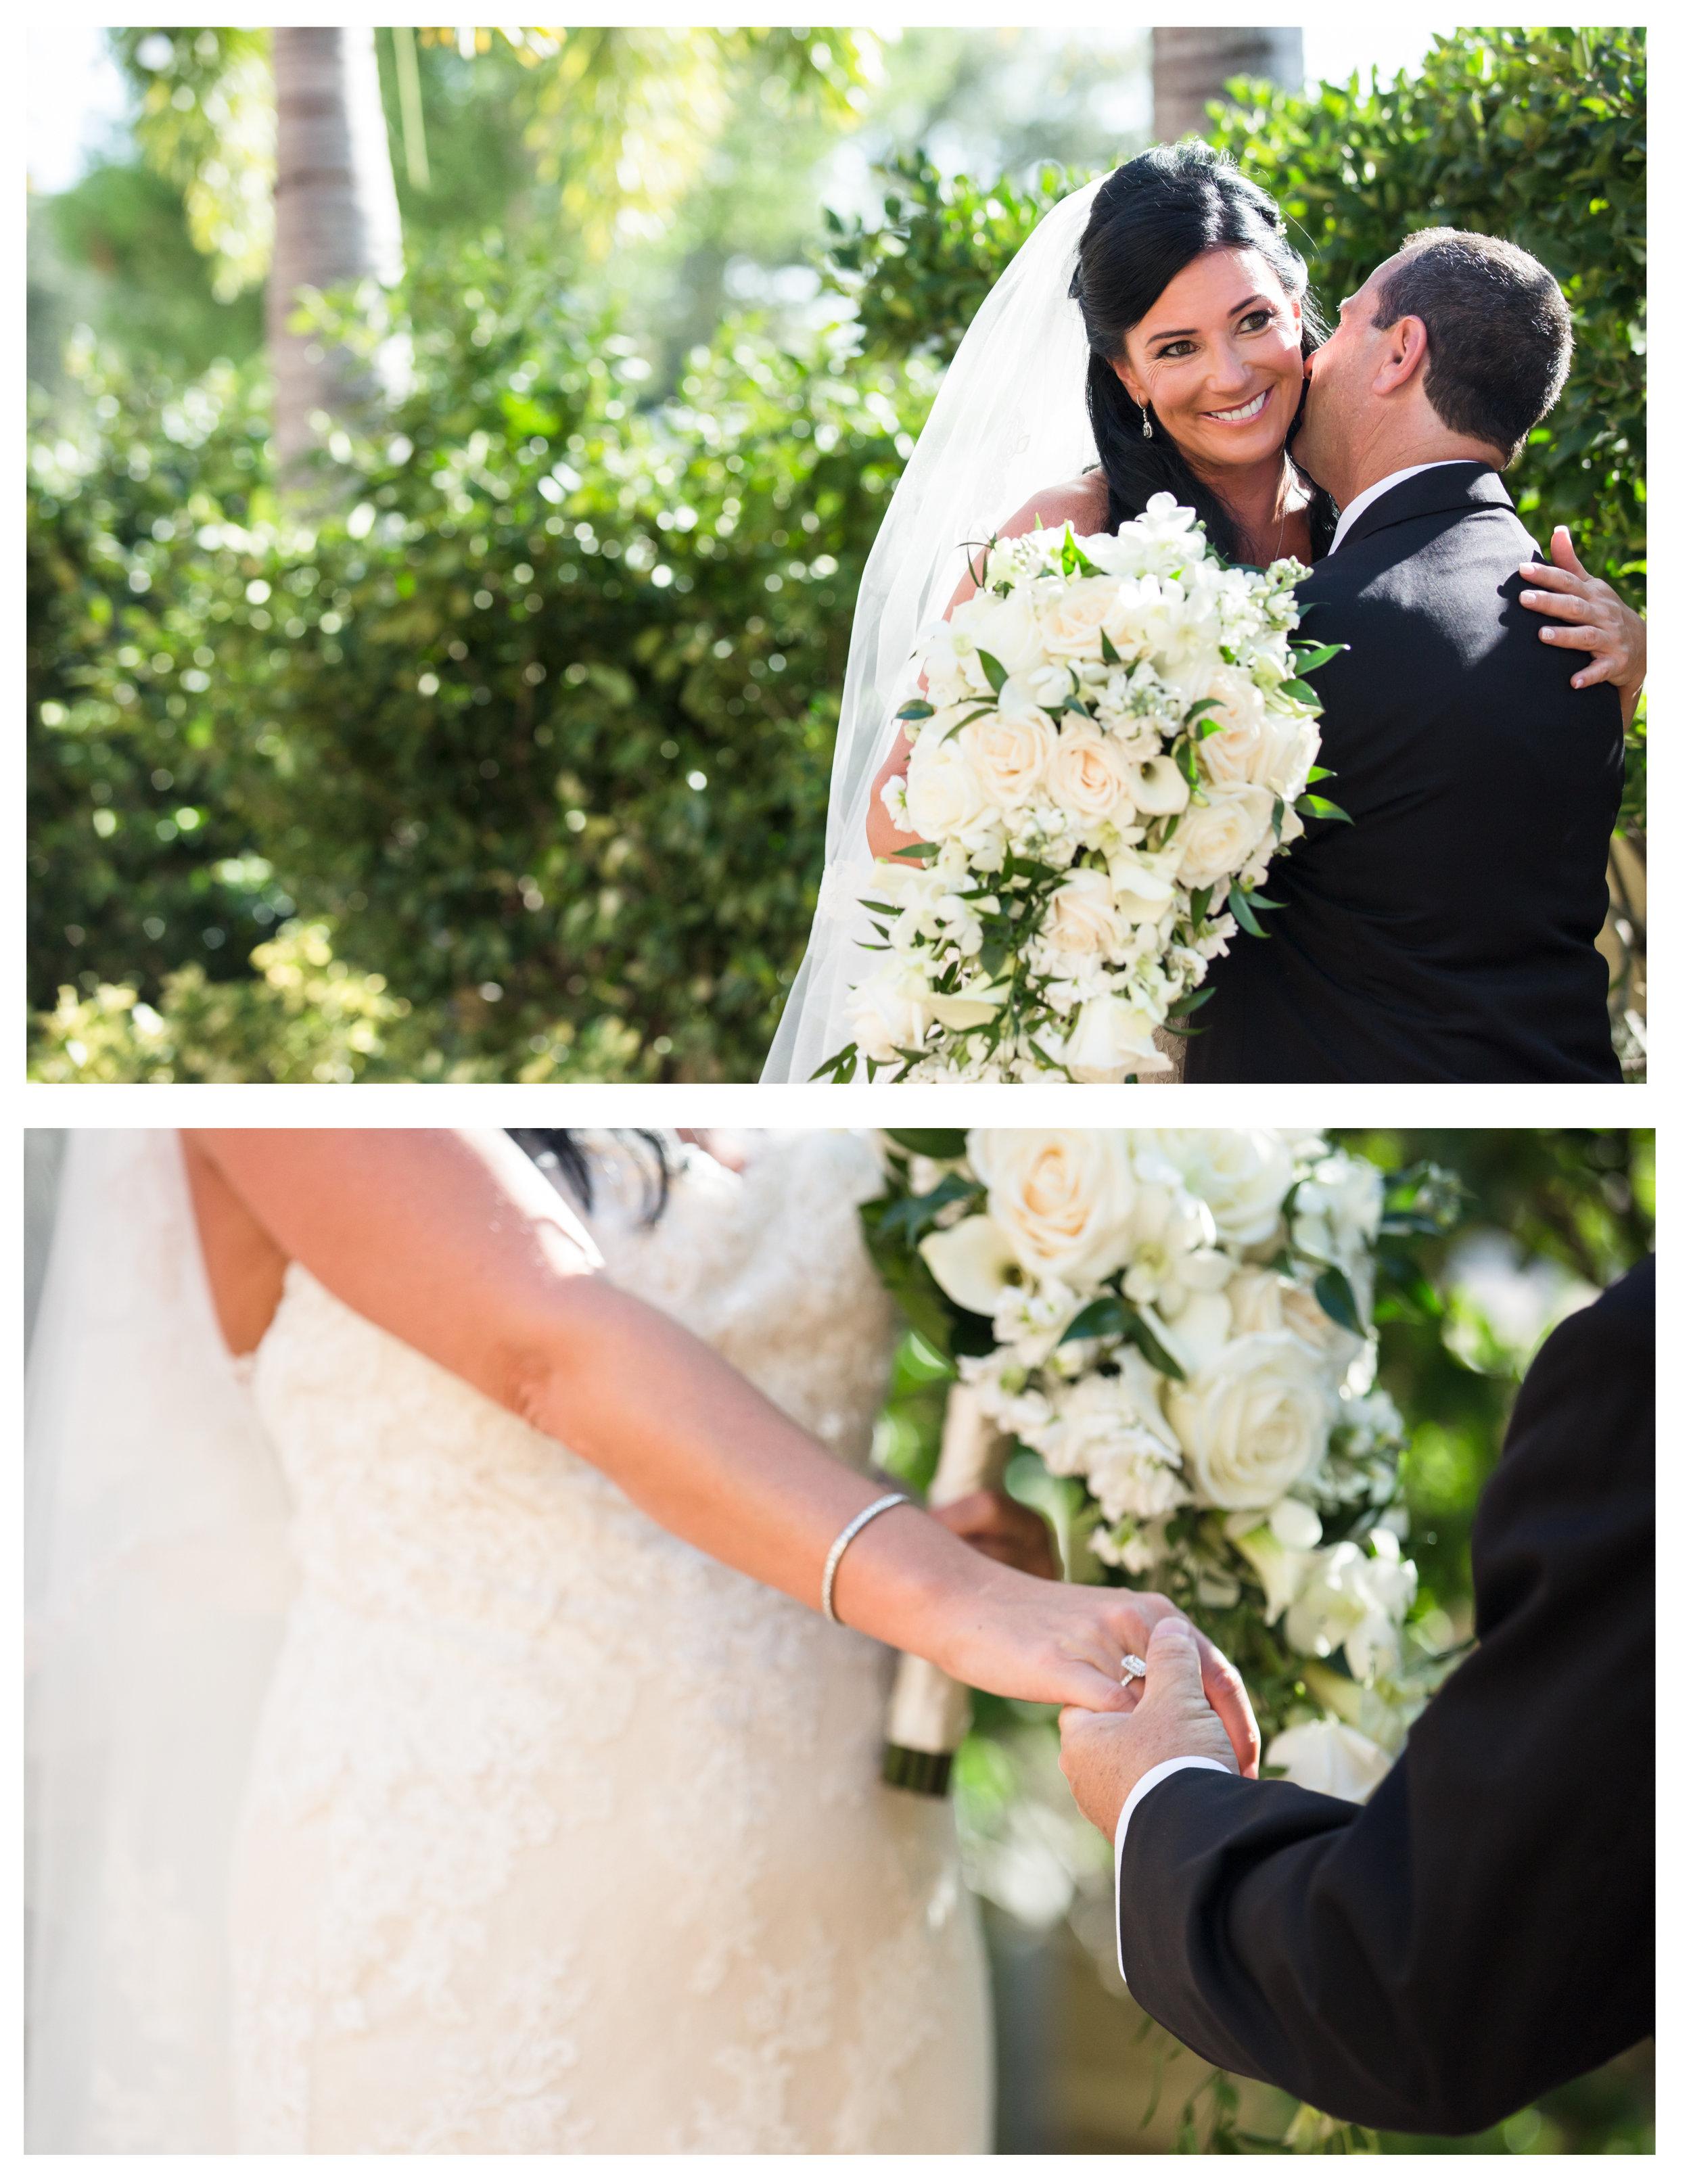 Benvenuto_Boynton_Beach_Wedding_Christine_and Doug_Married 3.jpg